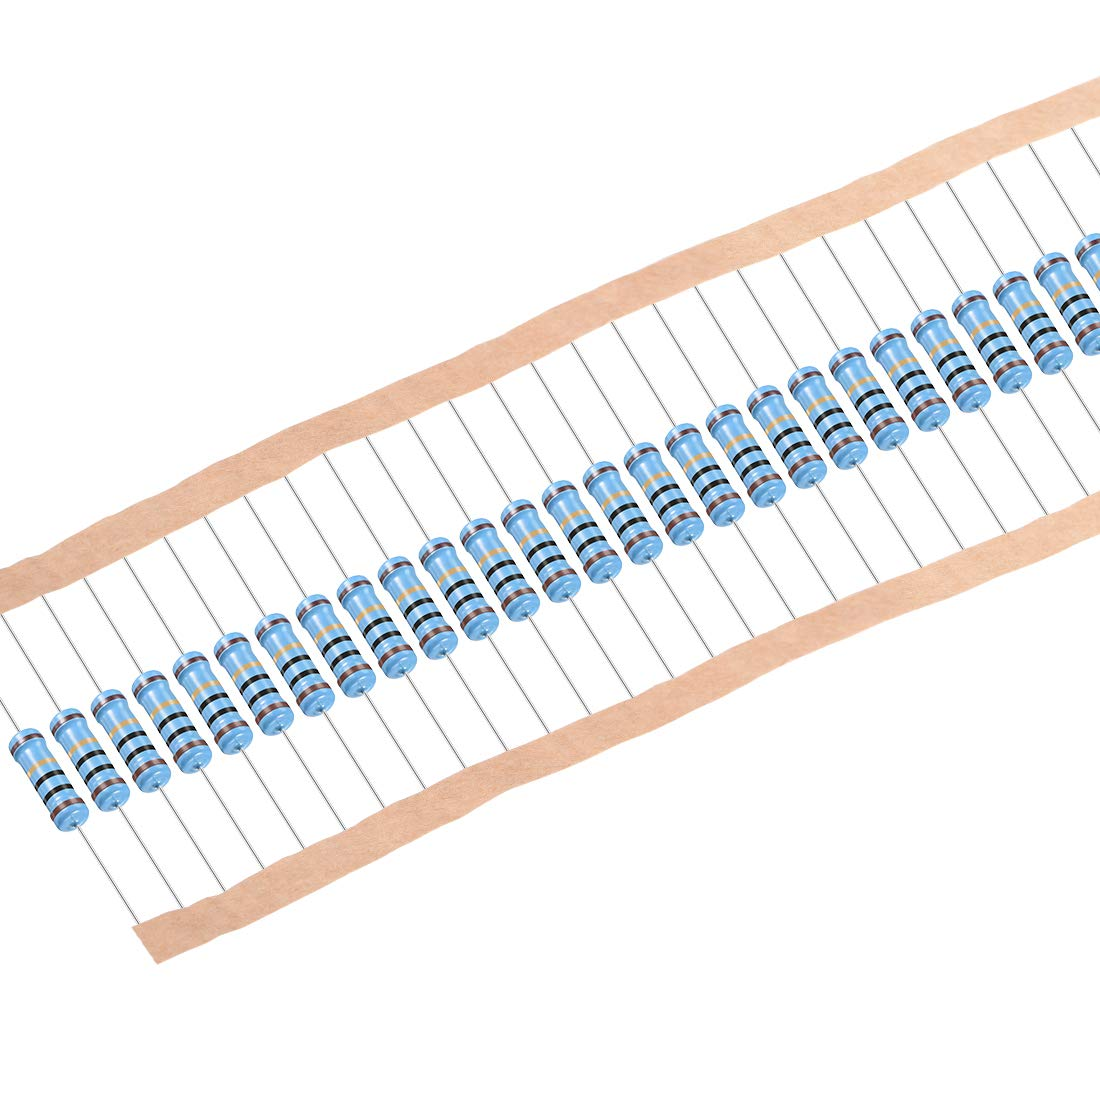 uxcell 30pcs Metal Film Resistors 10 Ohm 1W 1/% Tolerances 5 Color Bands